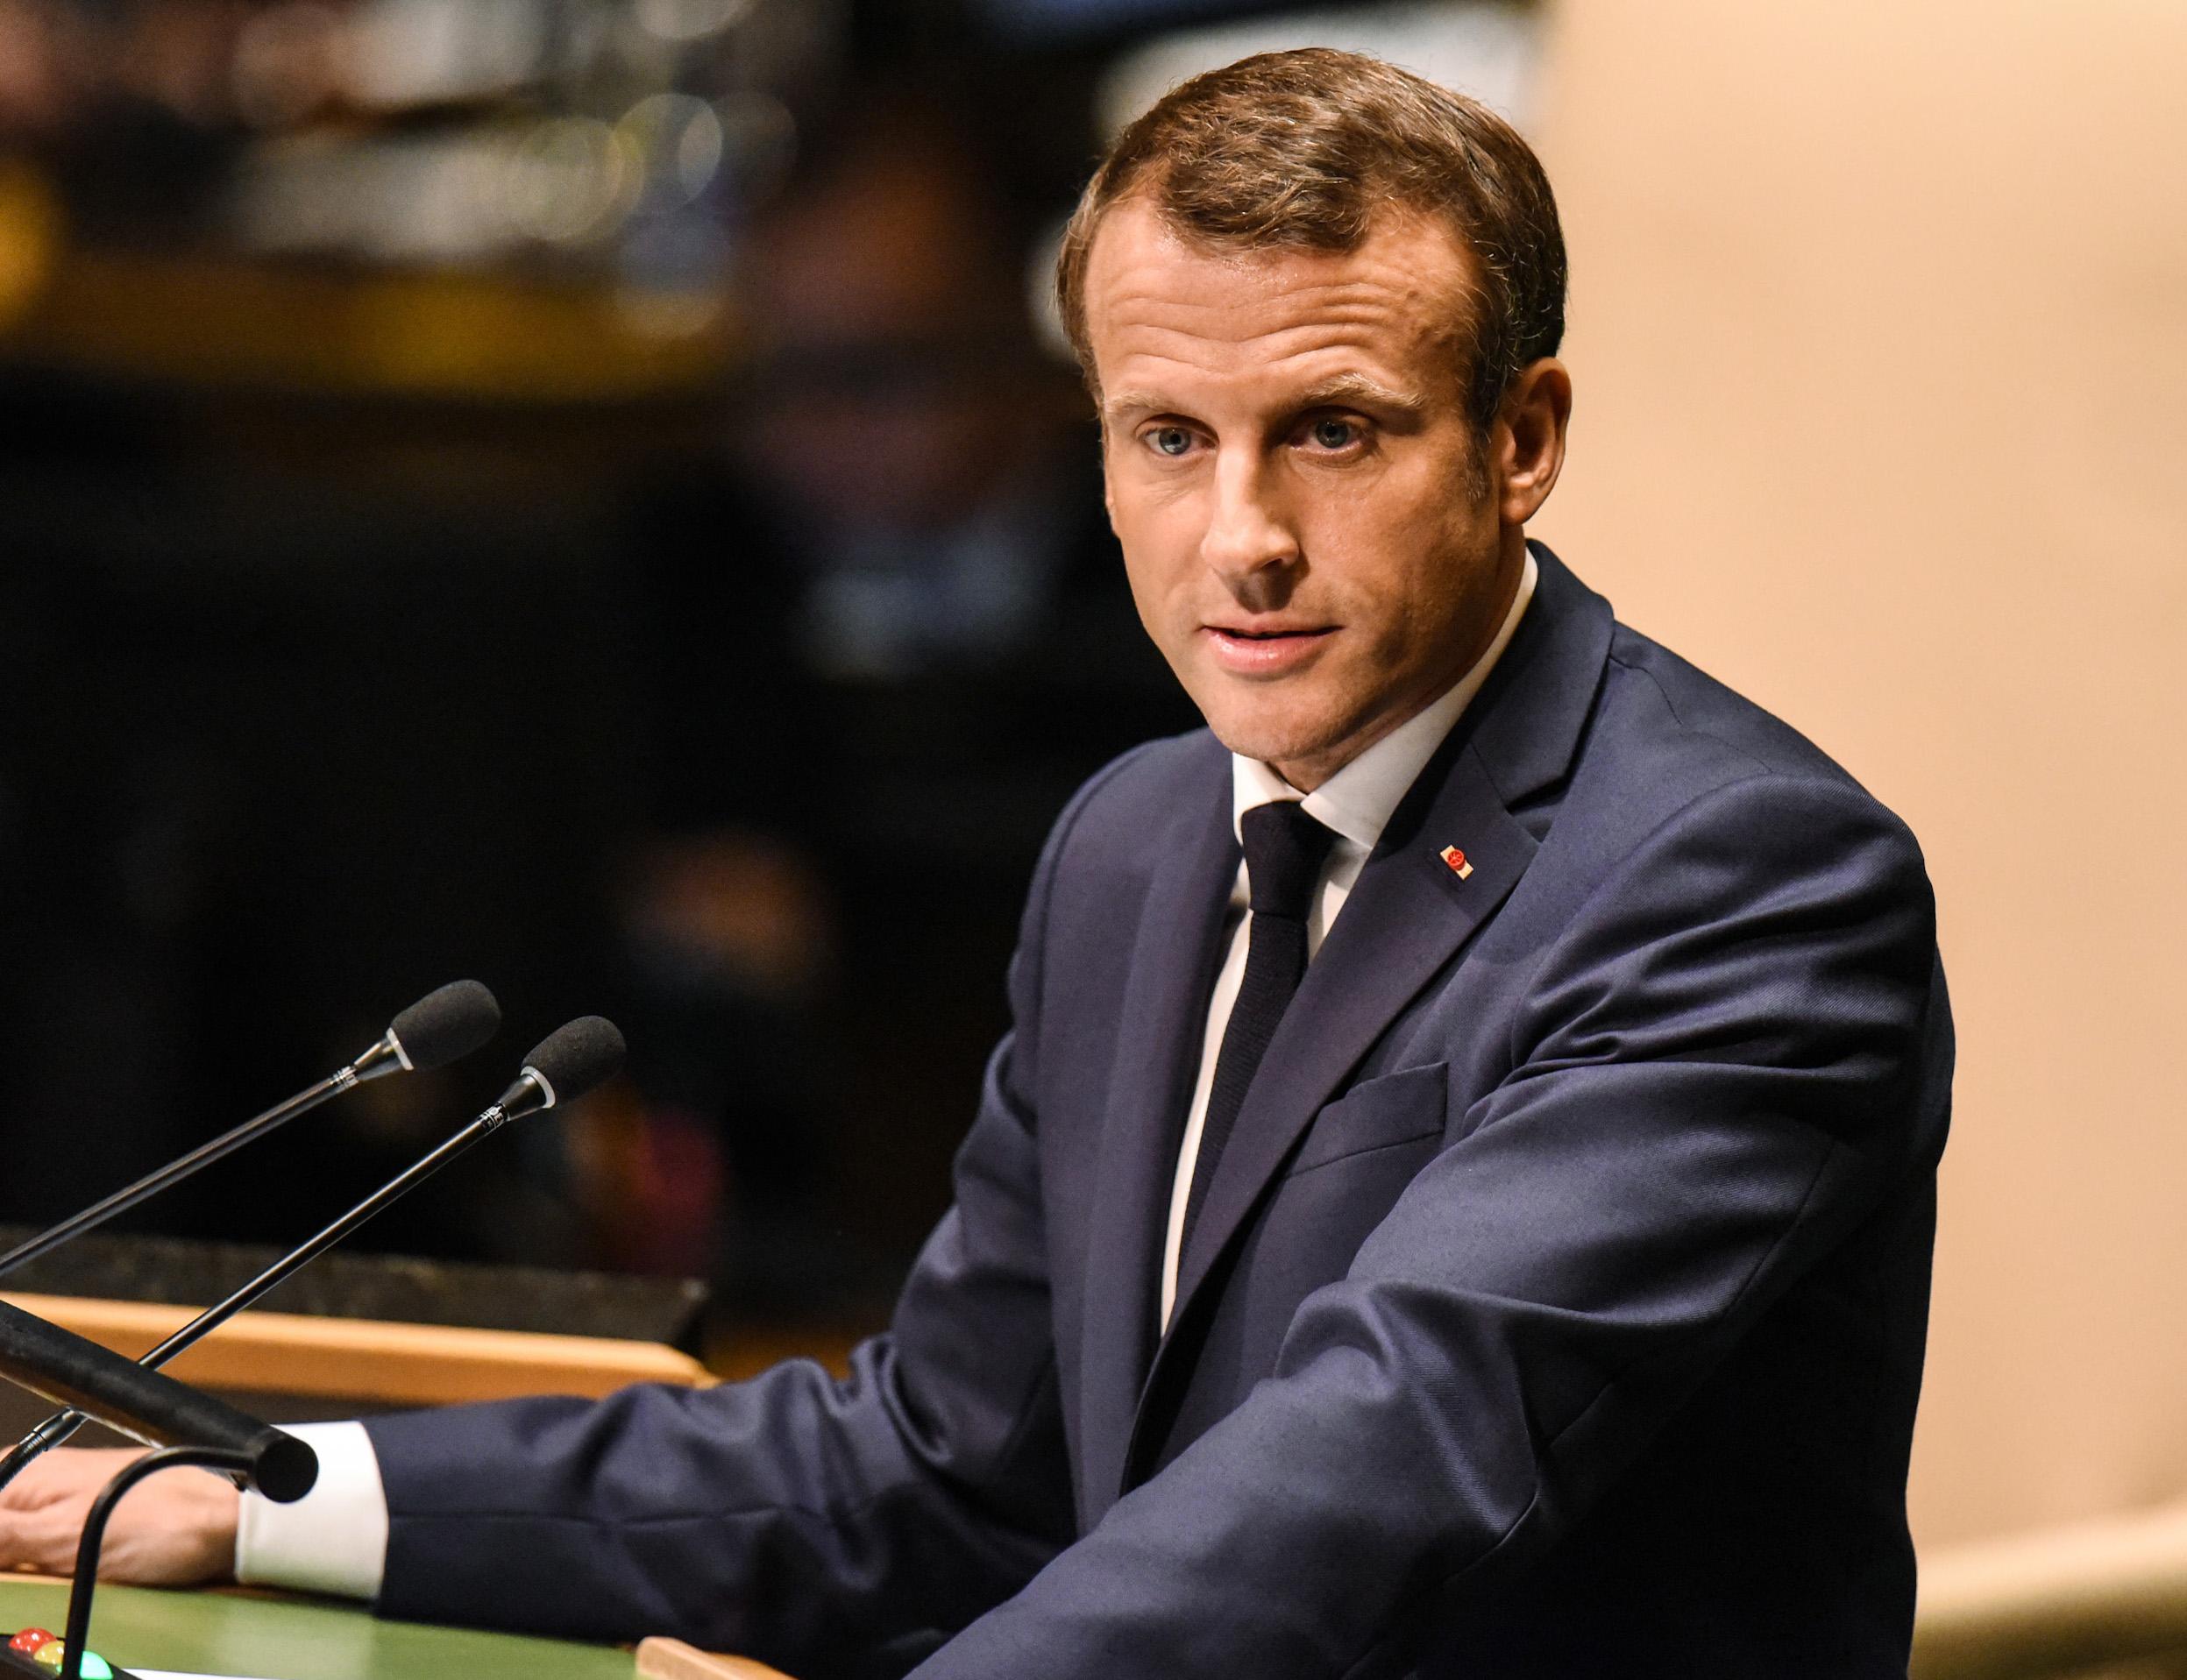 Macron Faz Apelo Por Uniao Da Europa Ante Conduta Inaceitavel Da Turquia Folha Pe